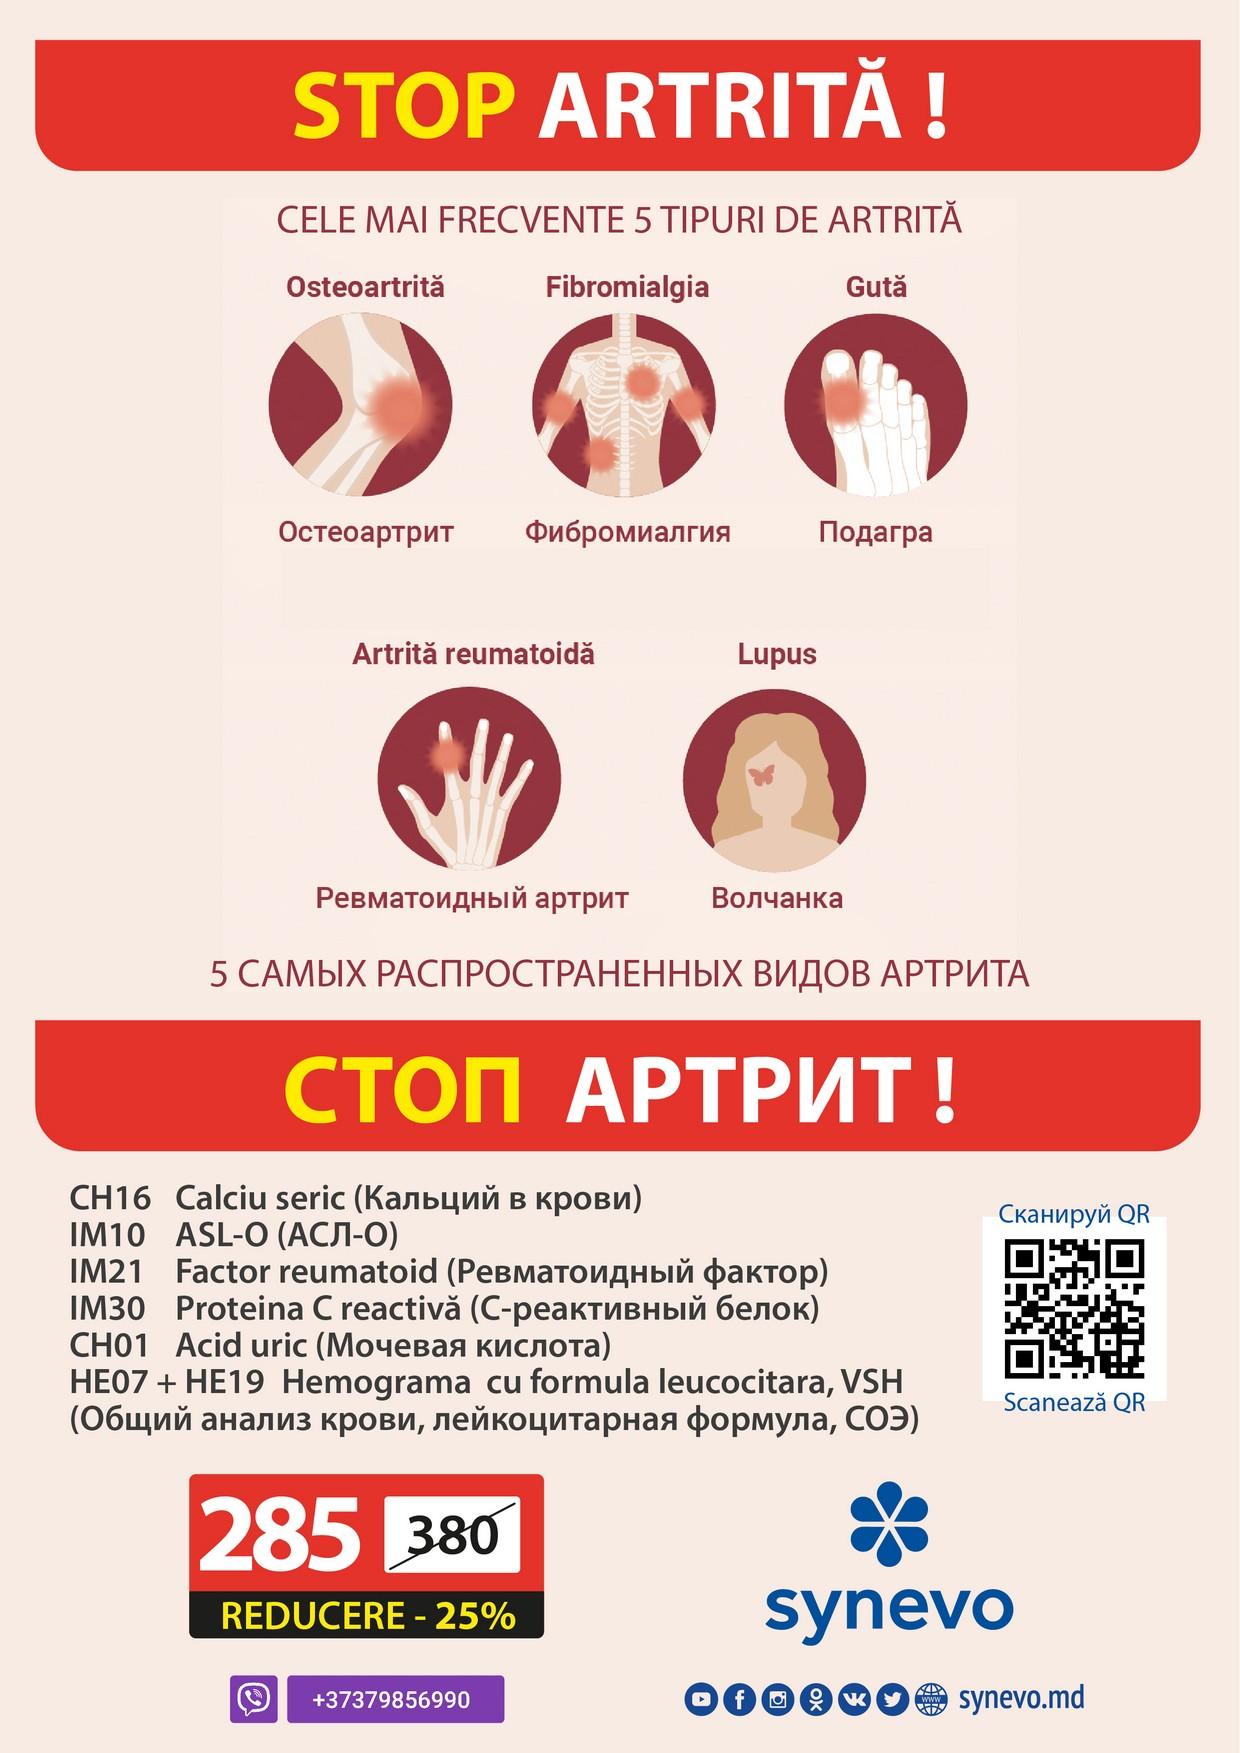 synevo - стоп артрит!